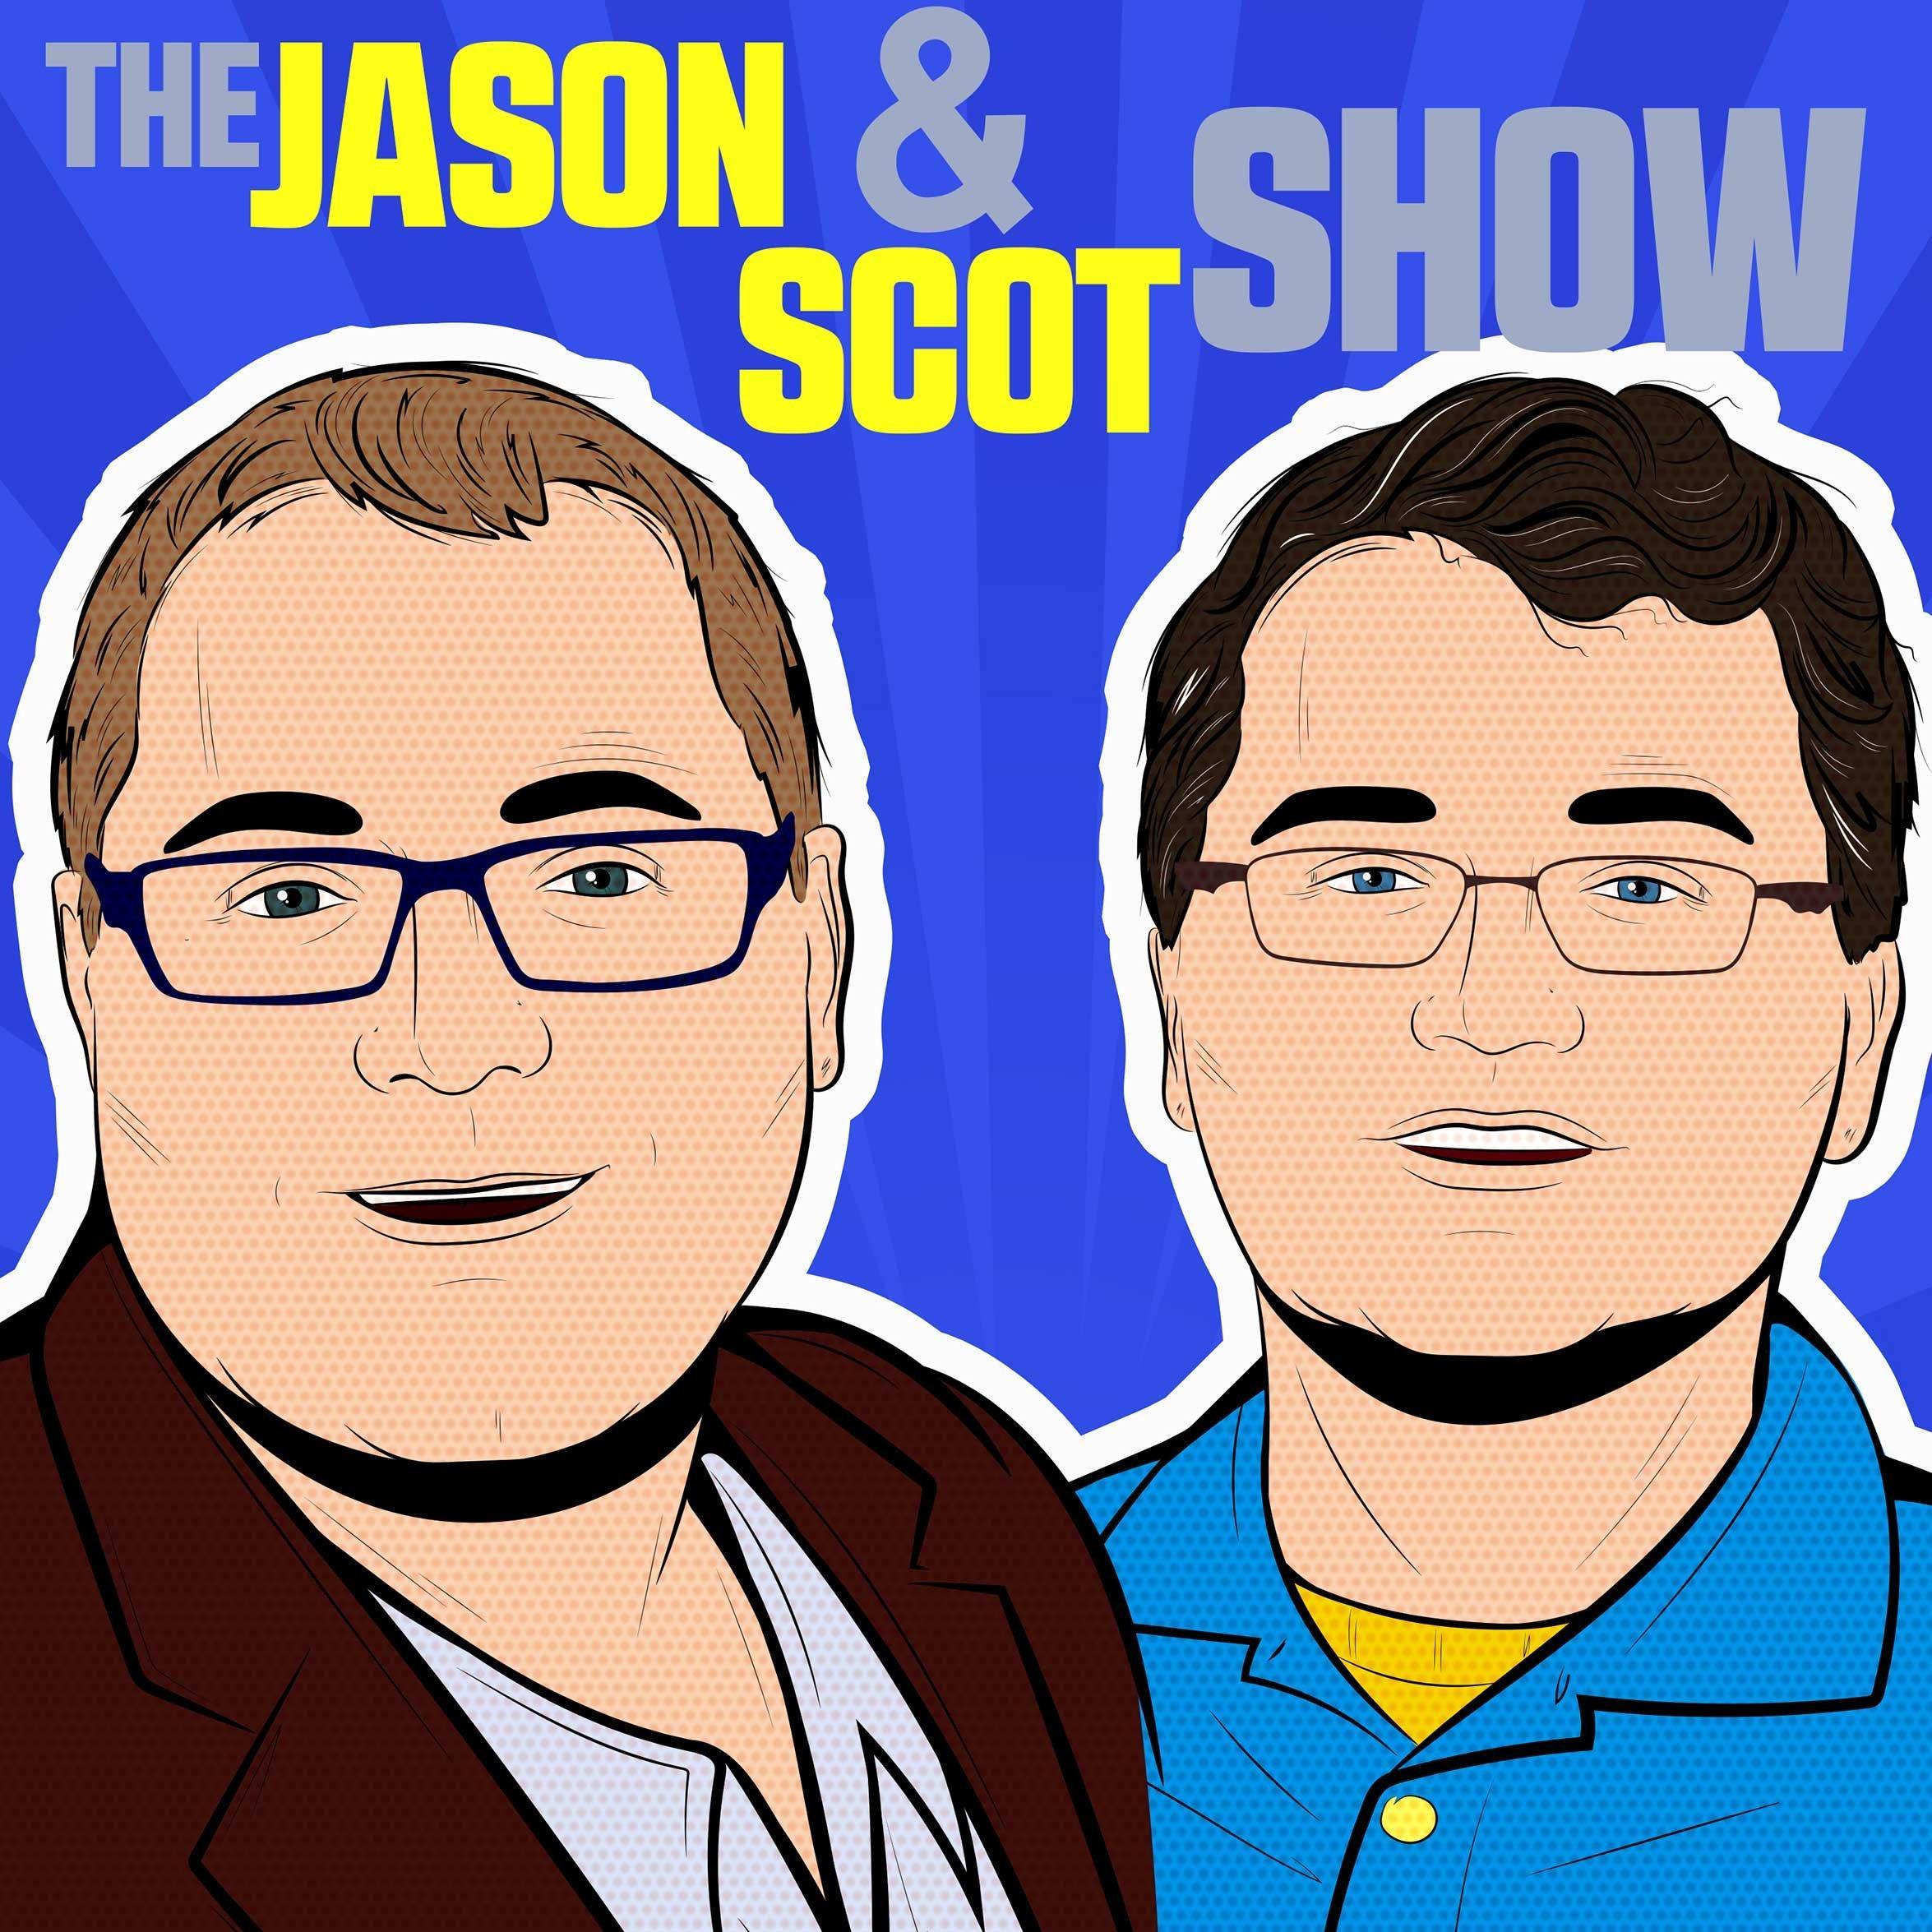 Jason & Scot Show Episode 82 Amazon Earning, Walmart and Other News ...